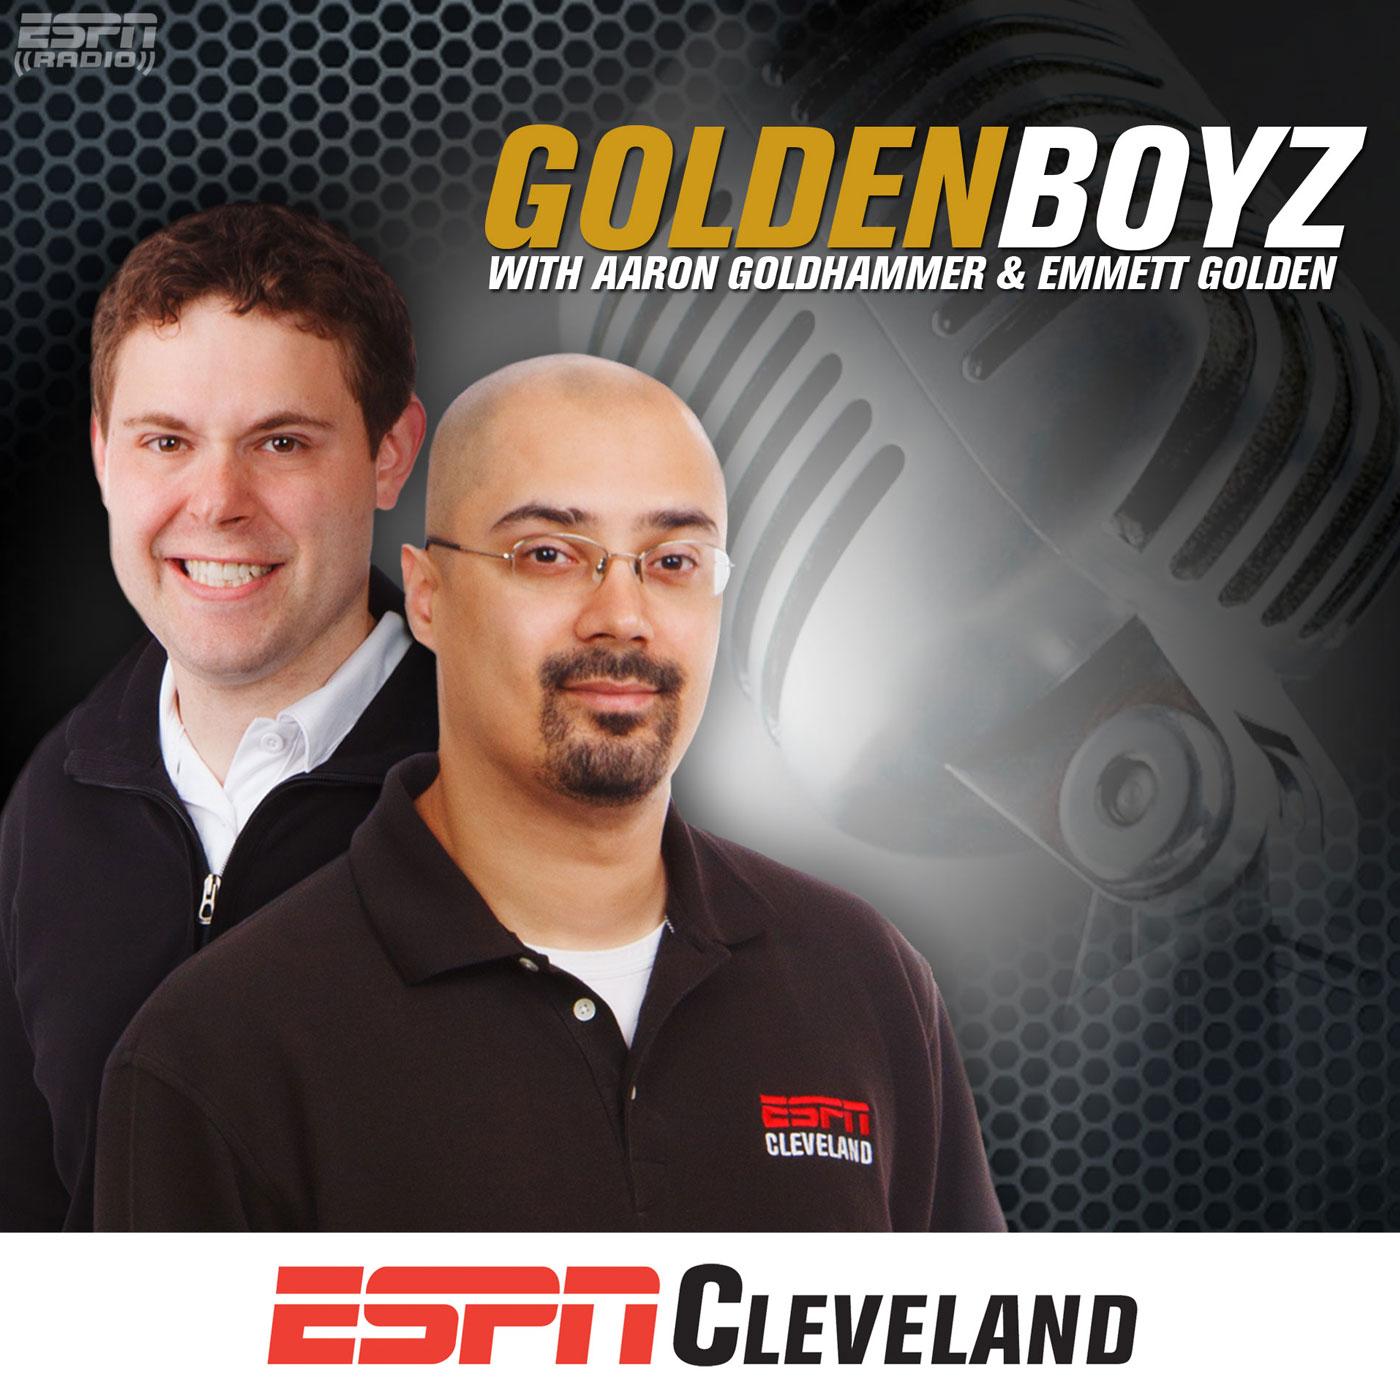 Golden Boyz